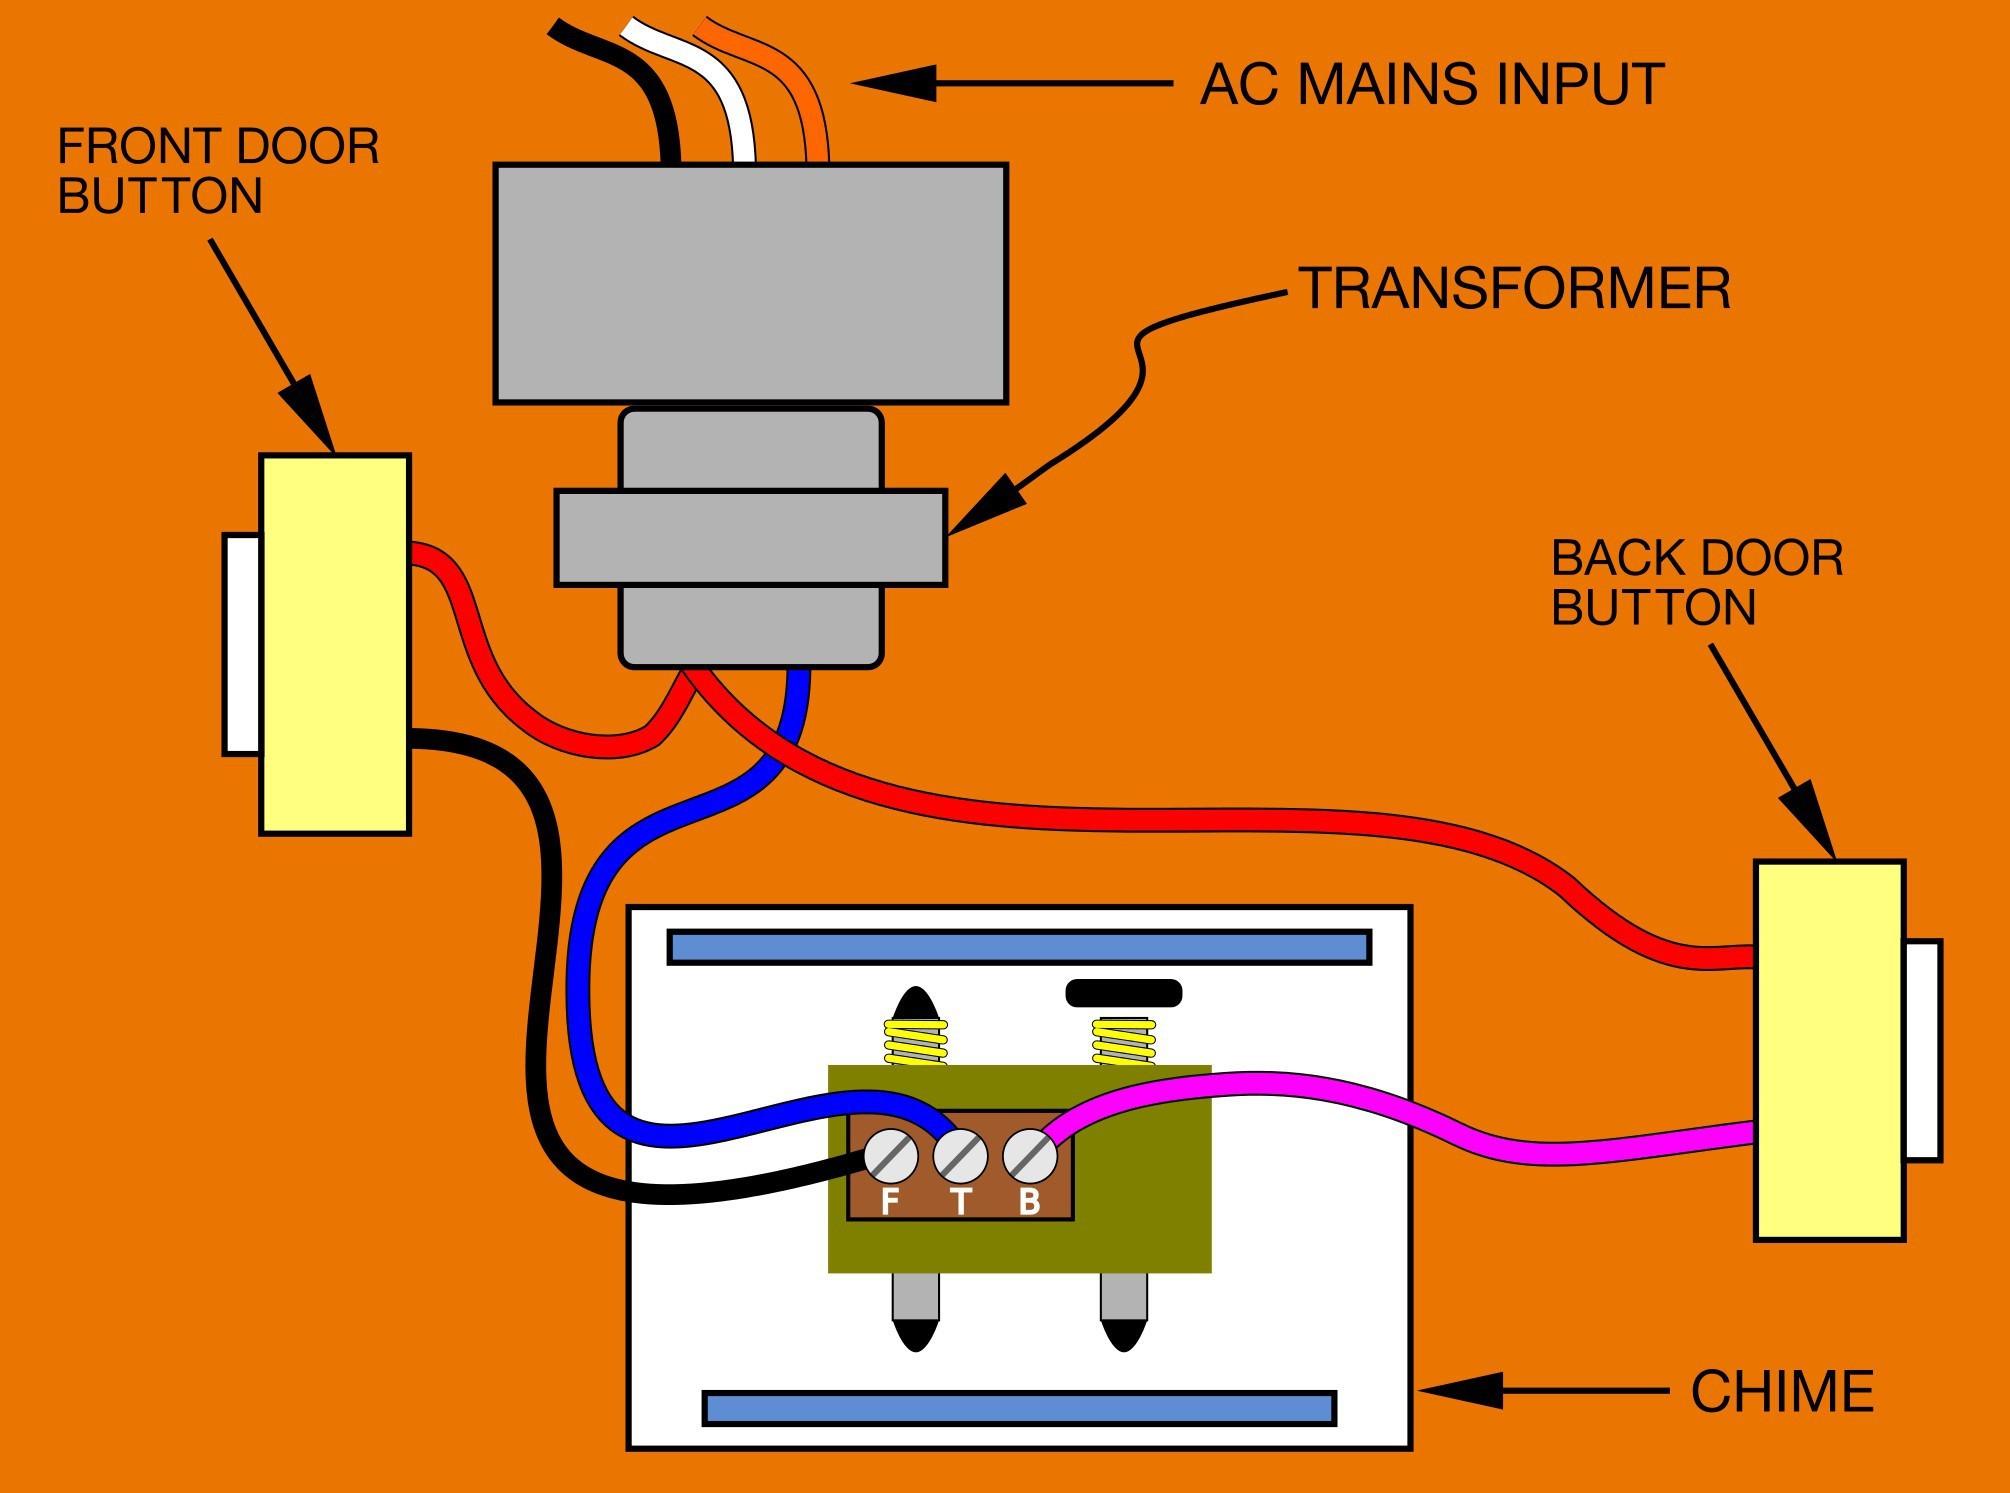 Wiring Diagram Doorbell Save Doorbell Wiring Diagram Awesome Nutone